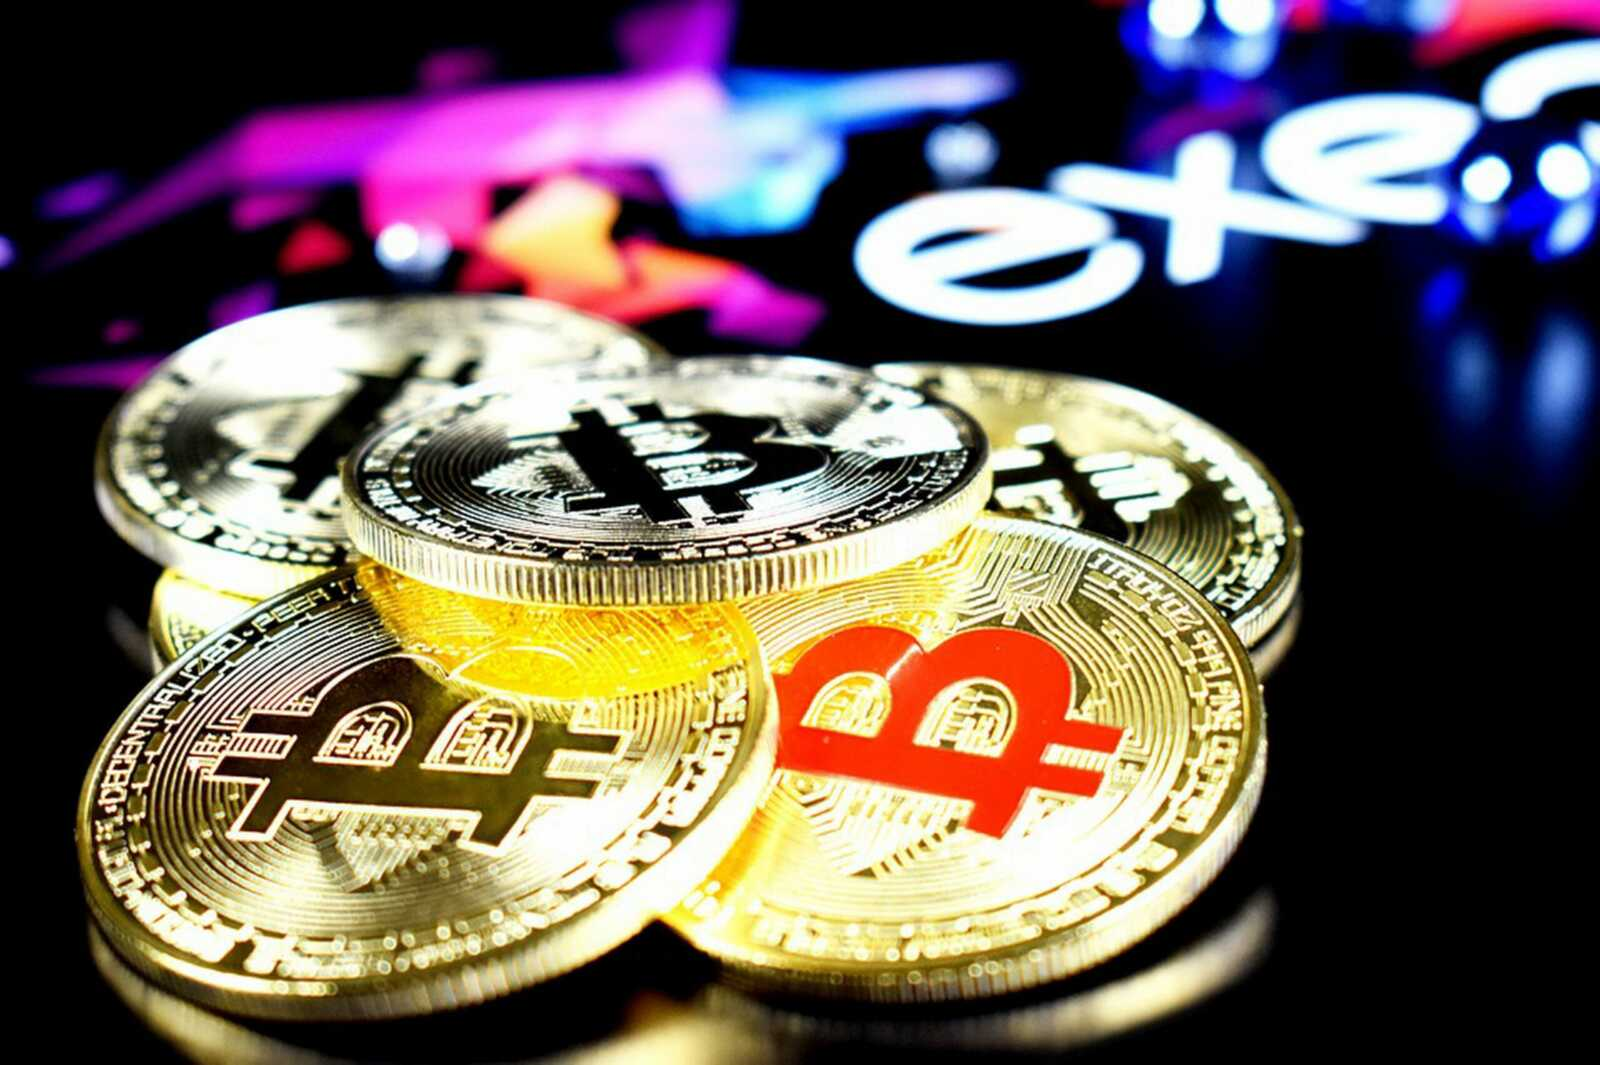 bitcoin 40 000 dolari gecti 602119aa182d6 scaled